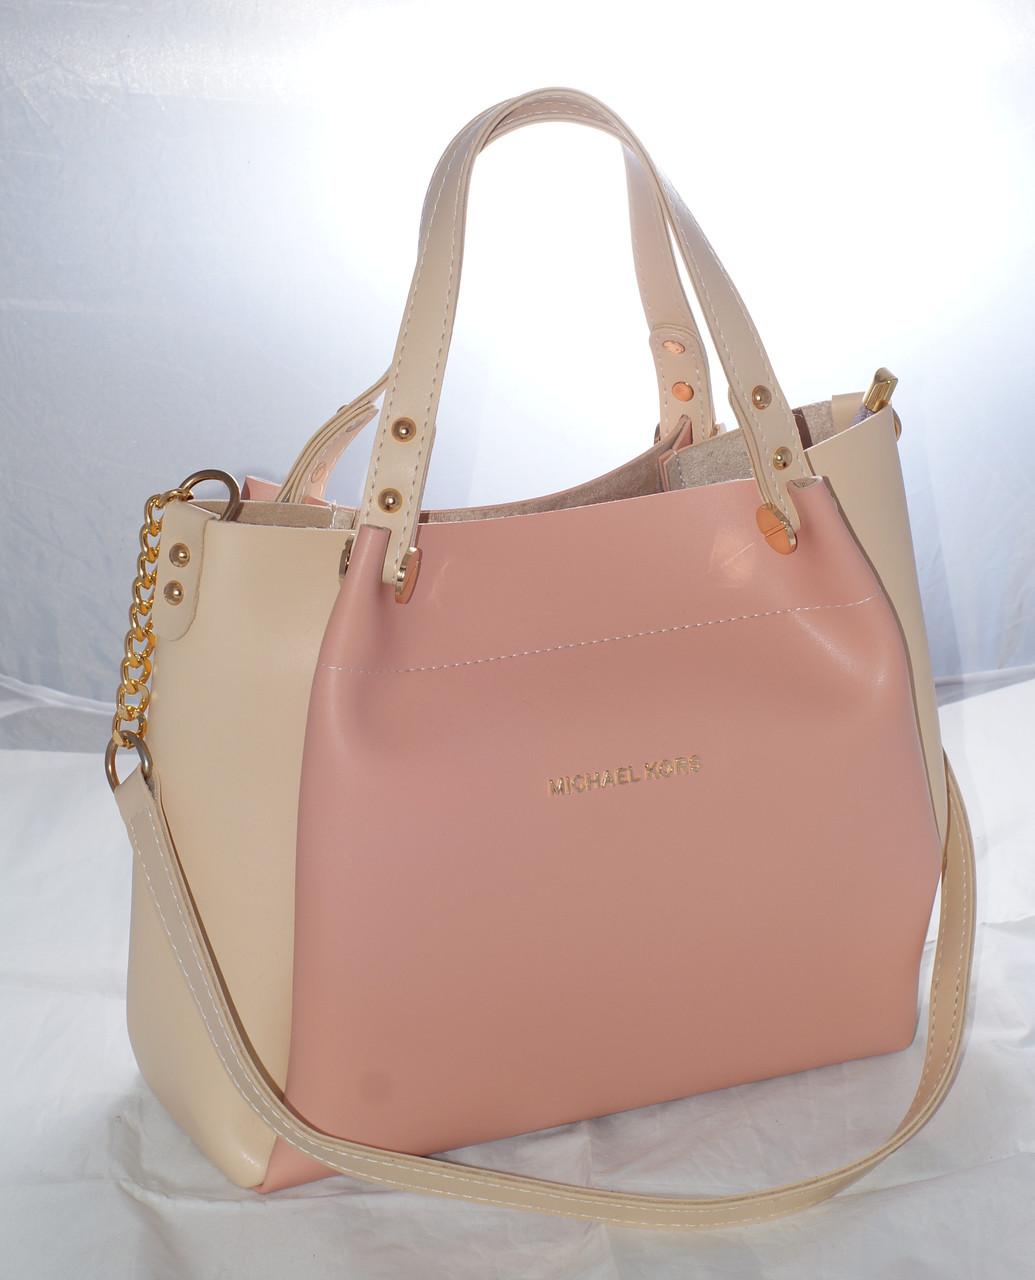 f54d315f49db Женская сумка Michael Kors (Майкл Корс), розовая с бежевым: продажа ...